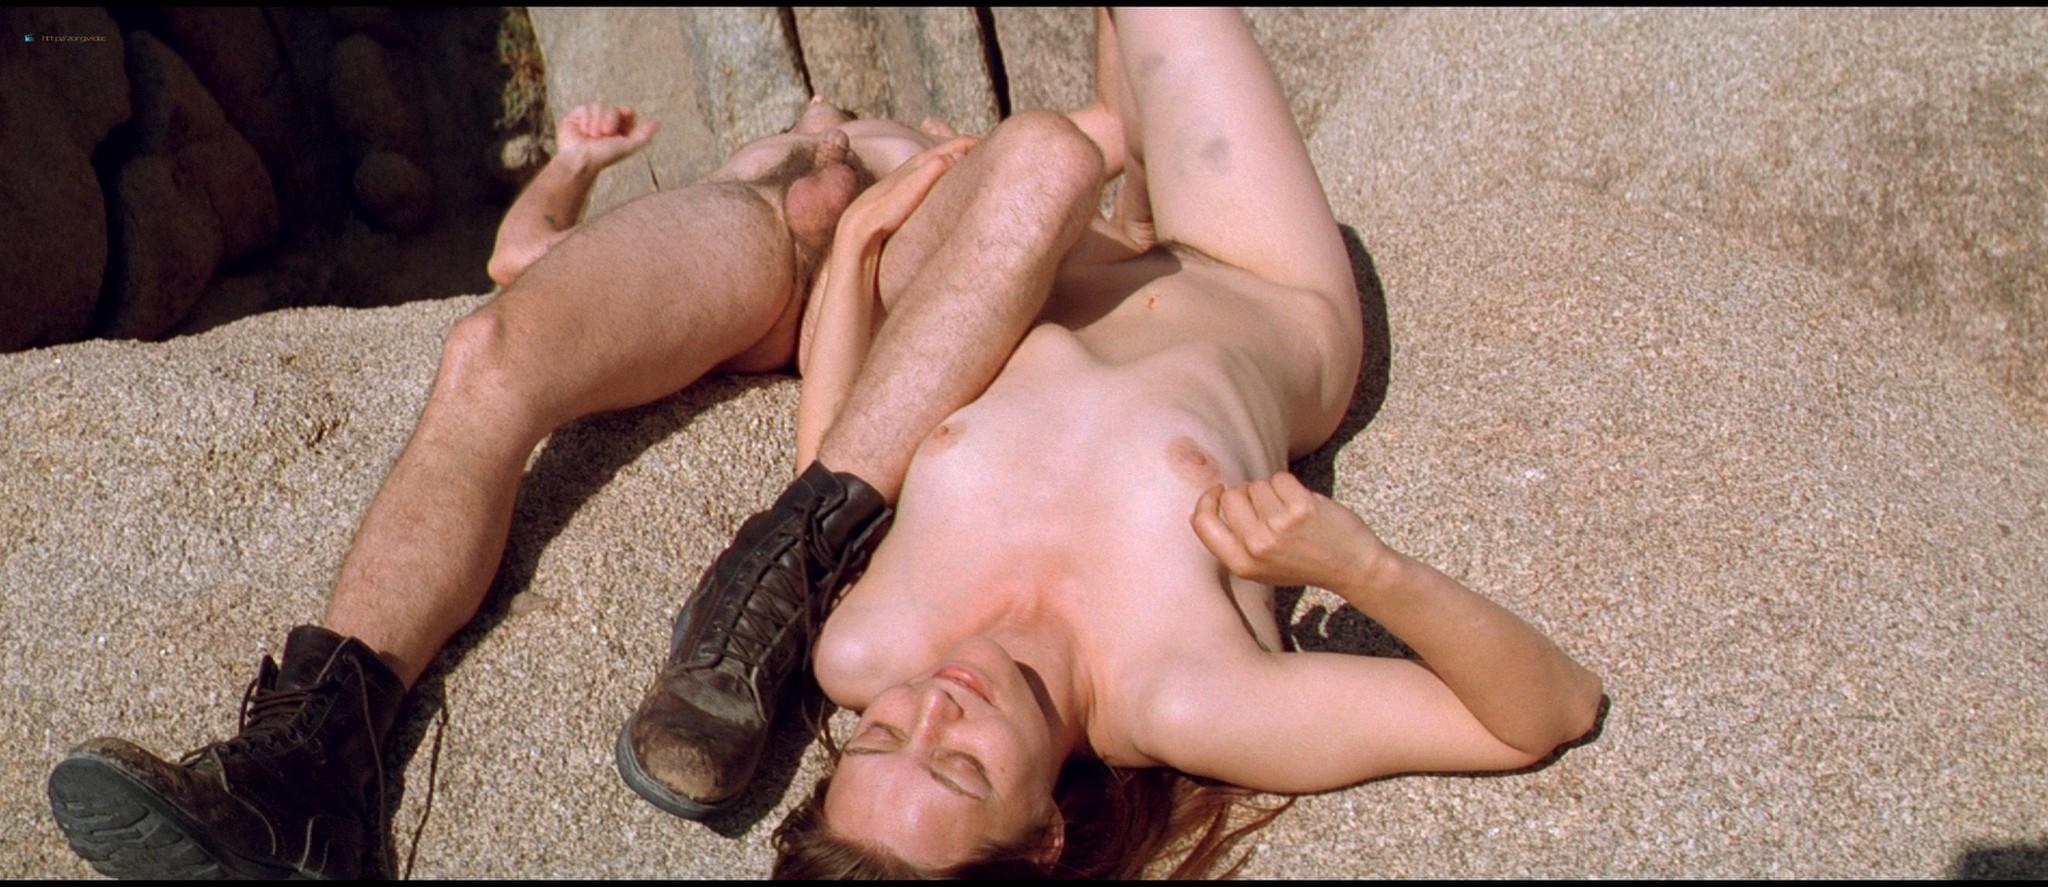 Yekaterina Golubeva nude full frontal explicit sex - Twentynine Palms (2003) HD 1080p BluRay REMUX (14)